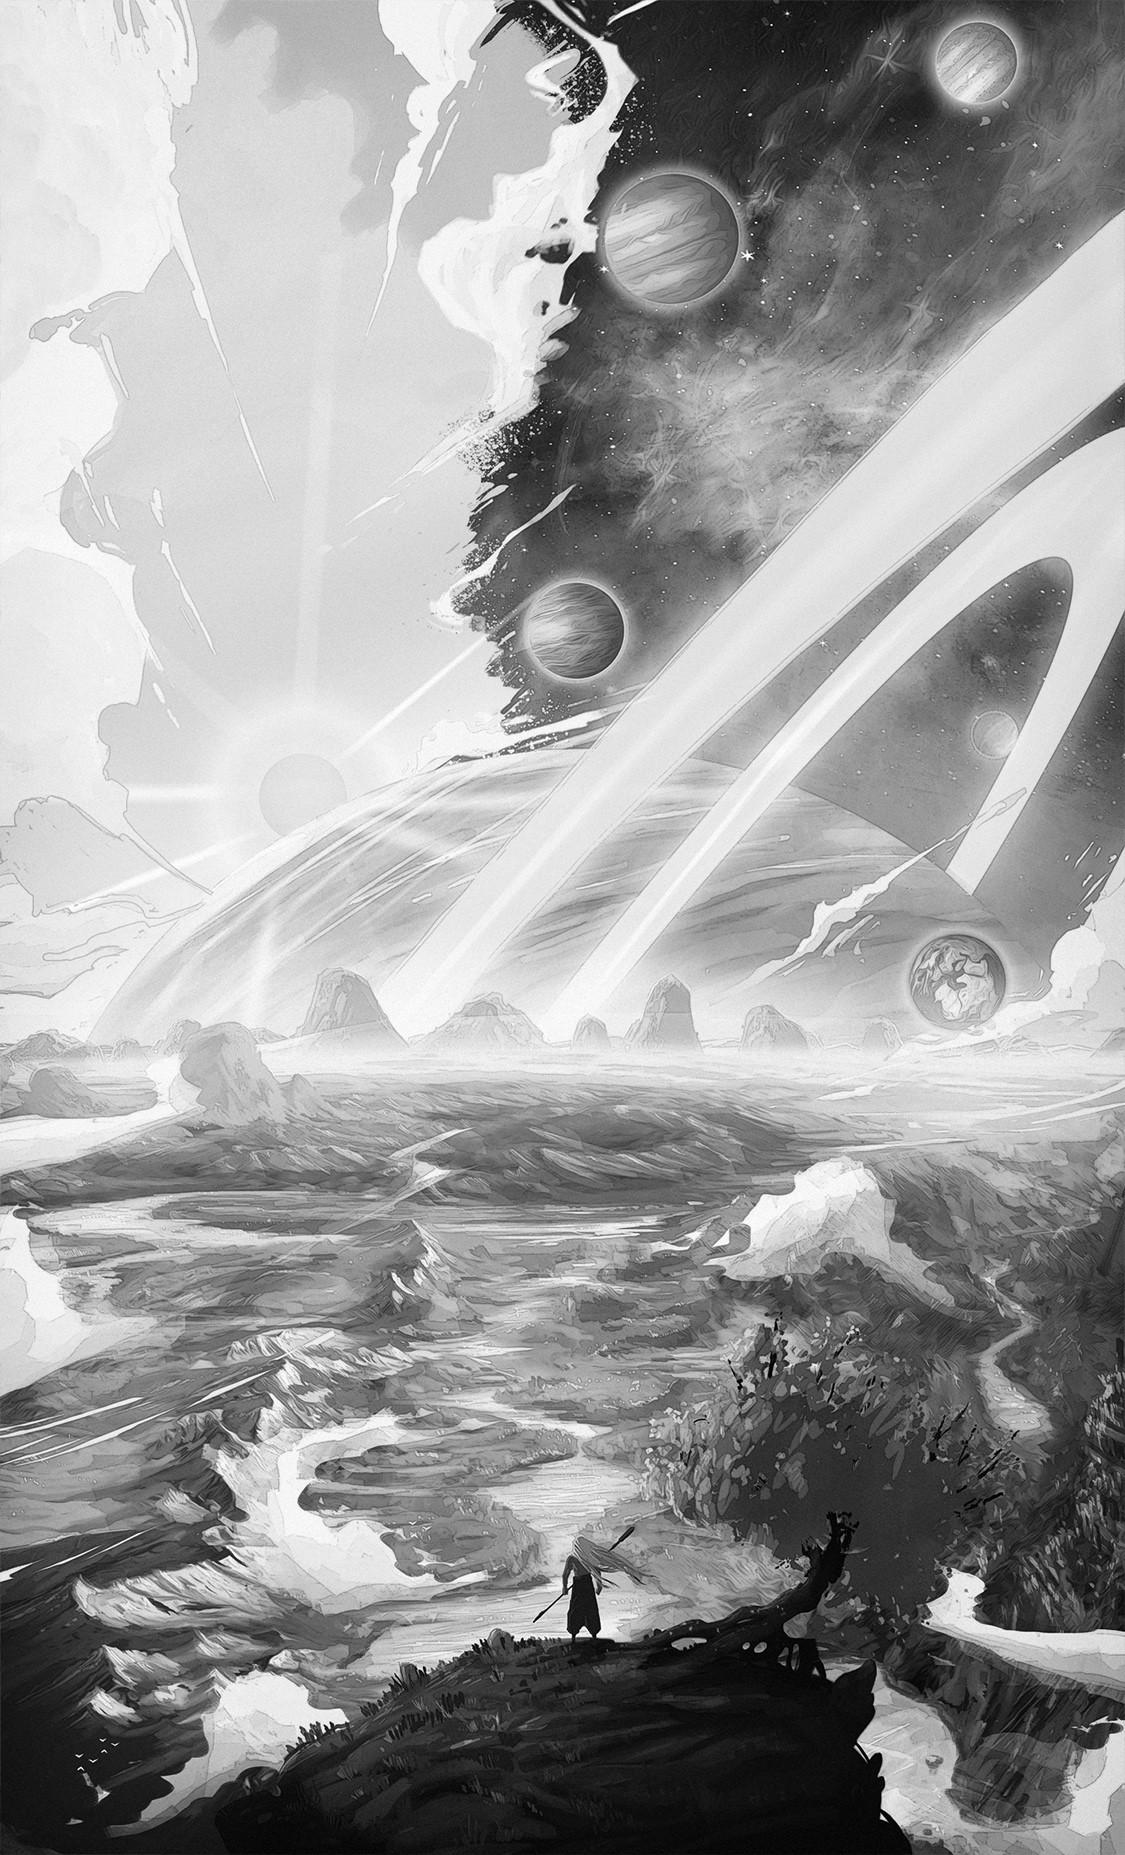 Christian benavides universe illustration sungmanitu f portfolio greyscale